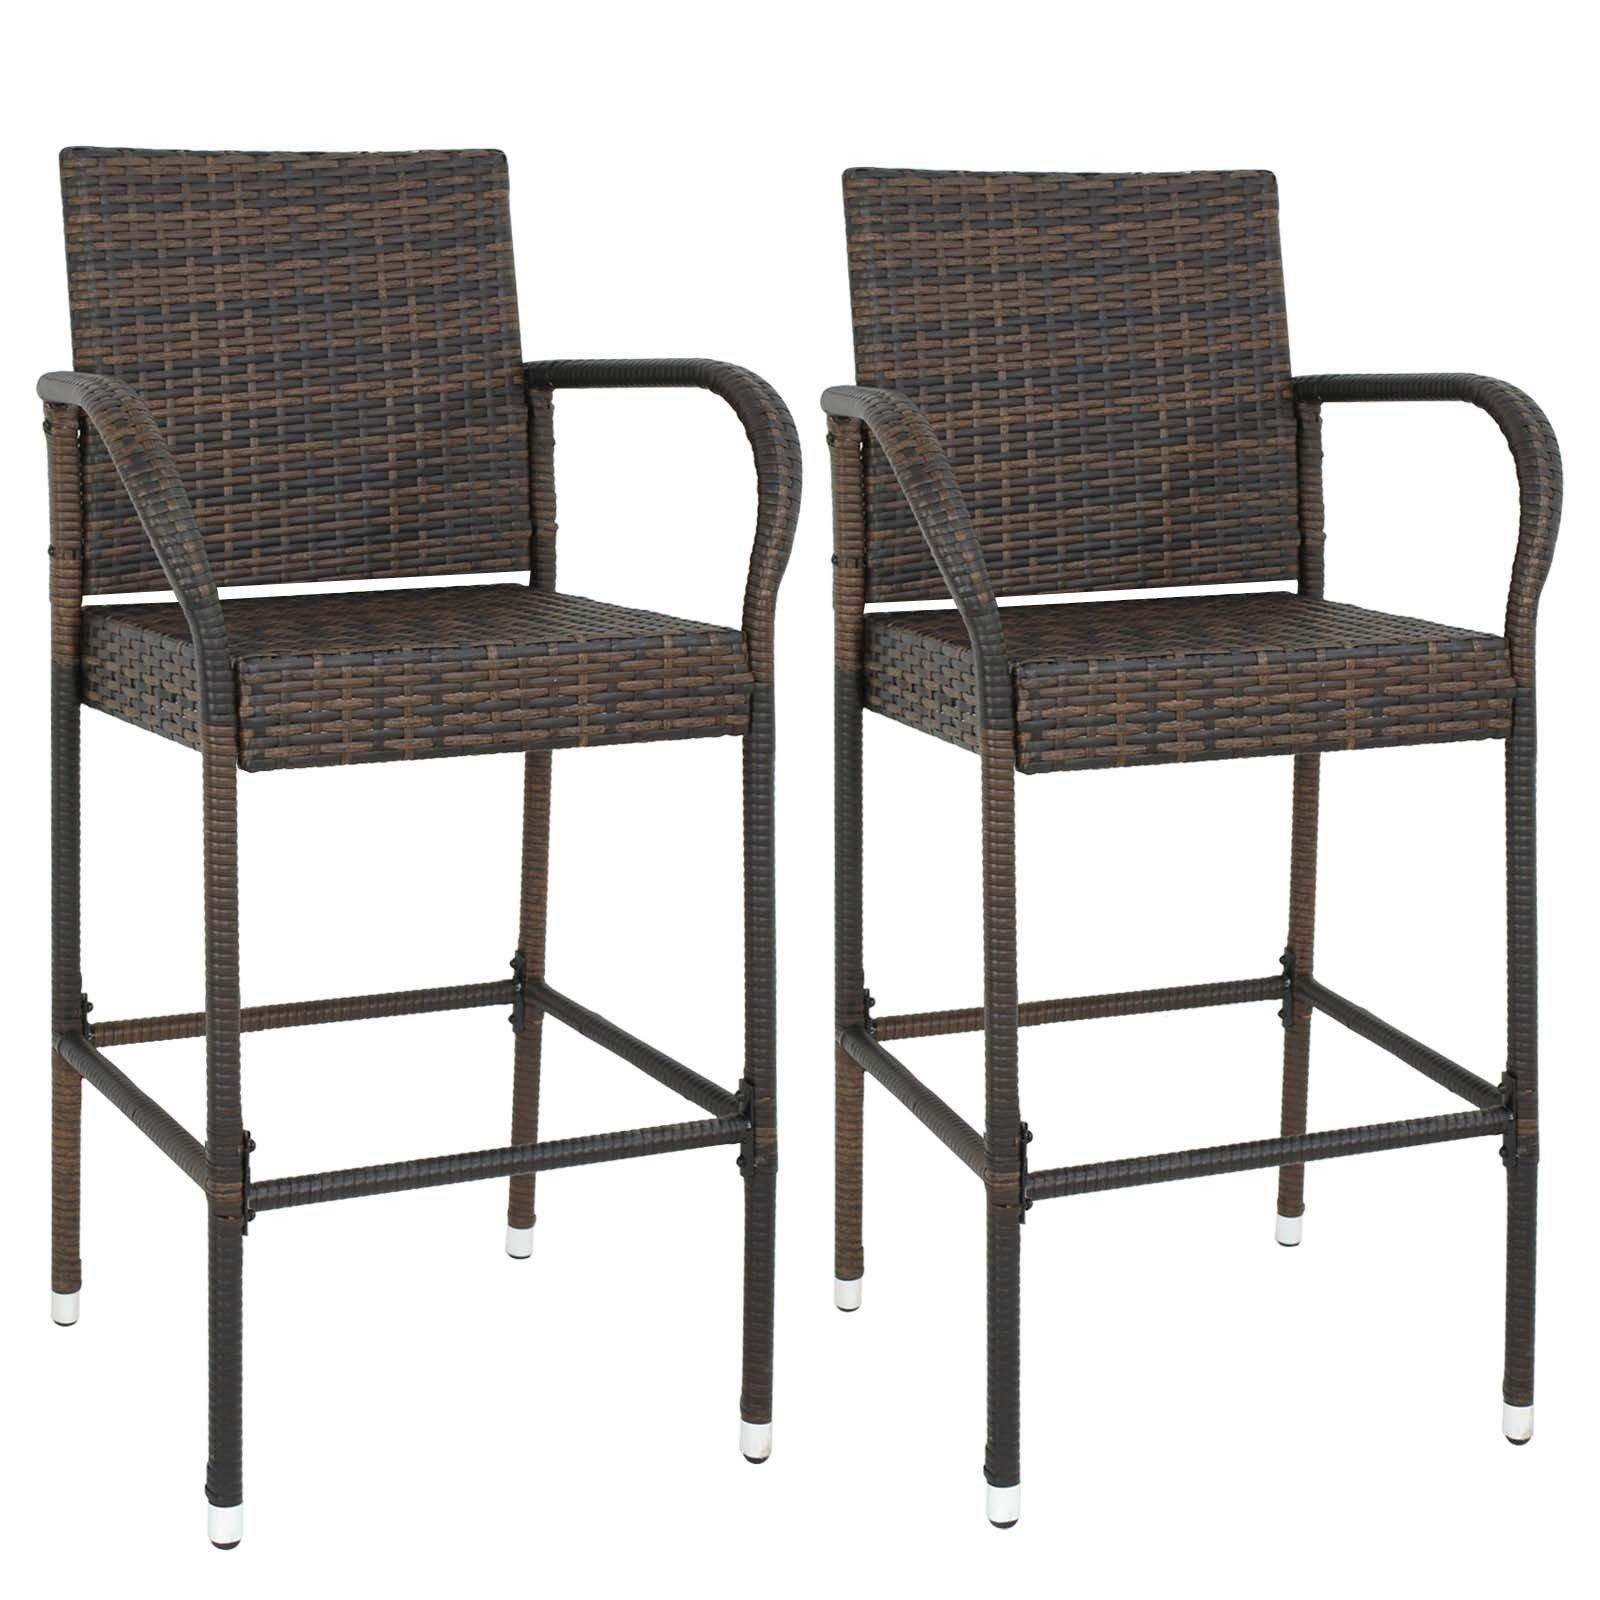 2 pcs Rattan Armrest Chair #GSMN